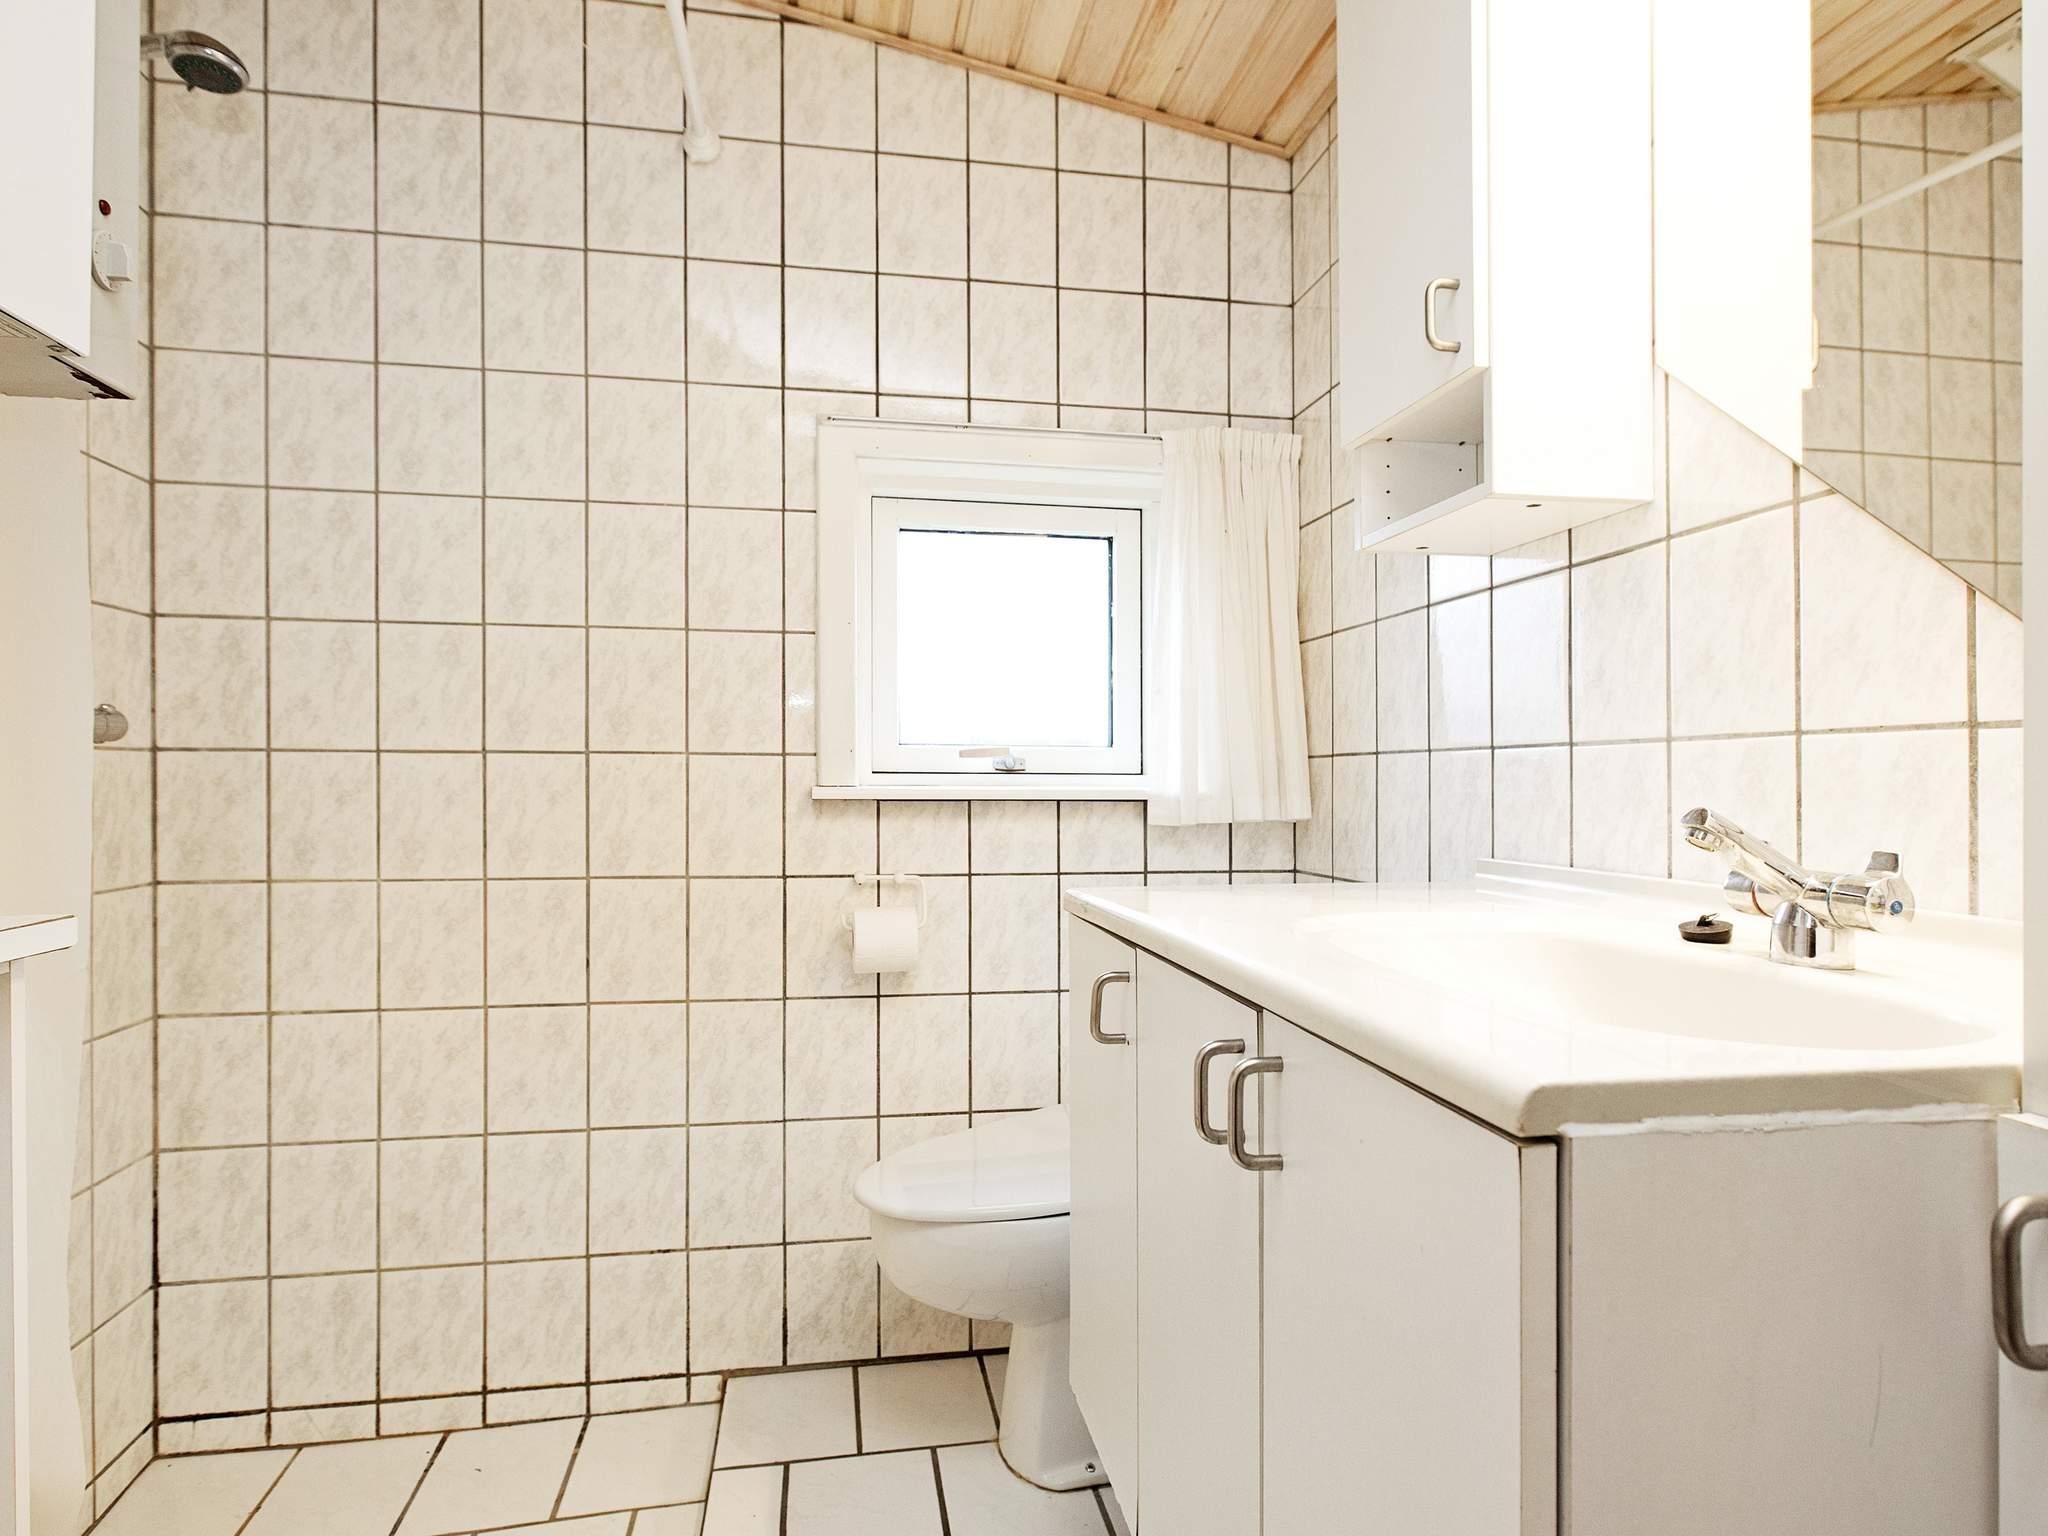 Maison de vacances Kramnitze (87262), Kramnitse, , Lolland, Danemark, image 18